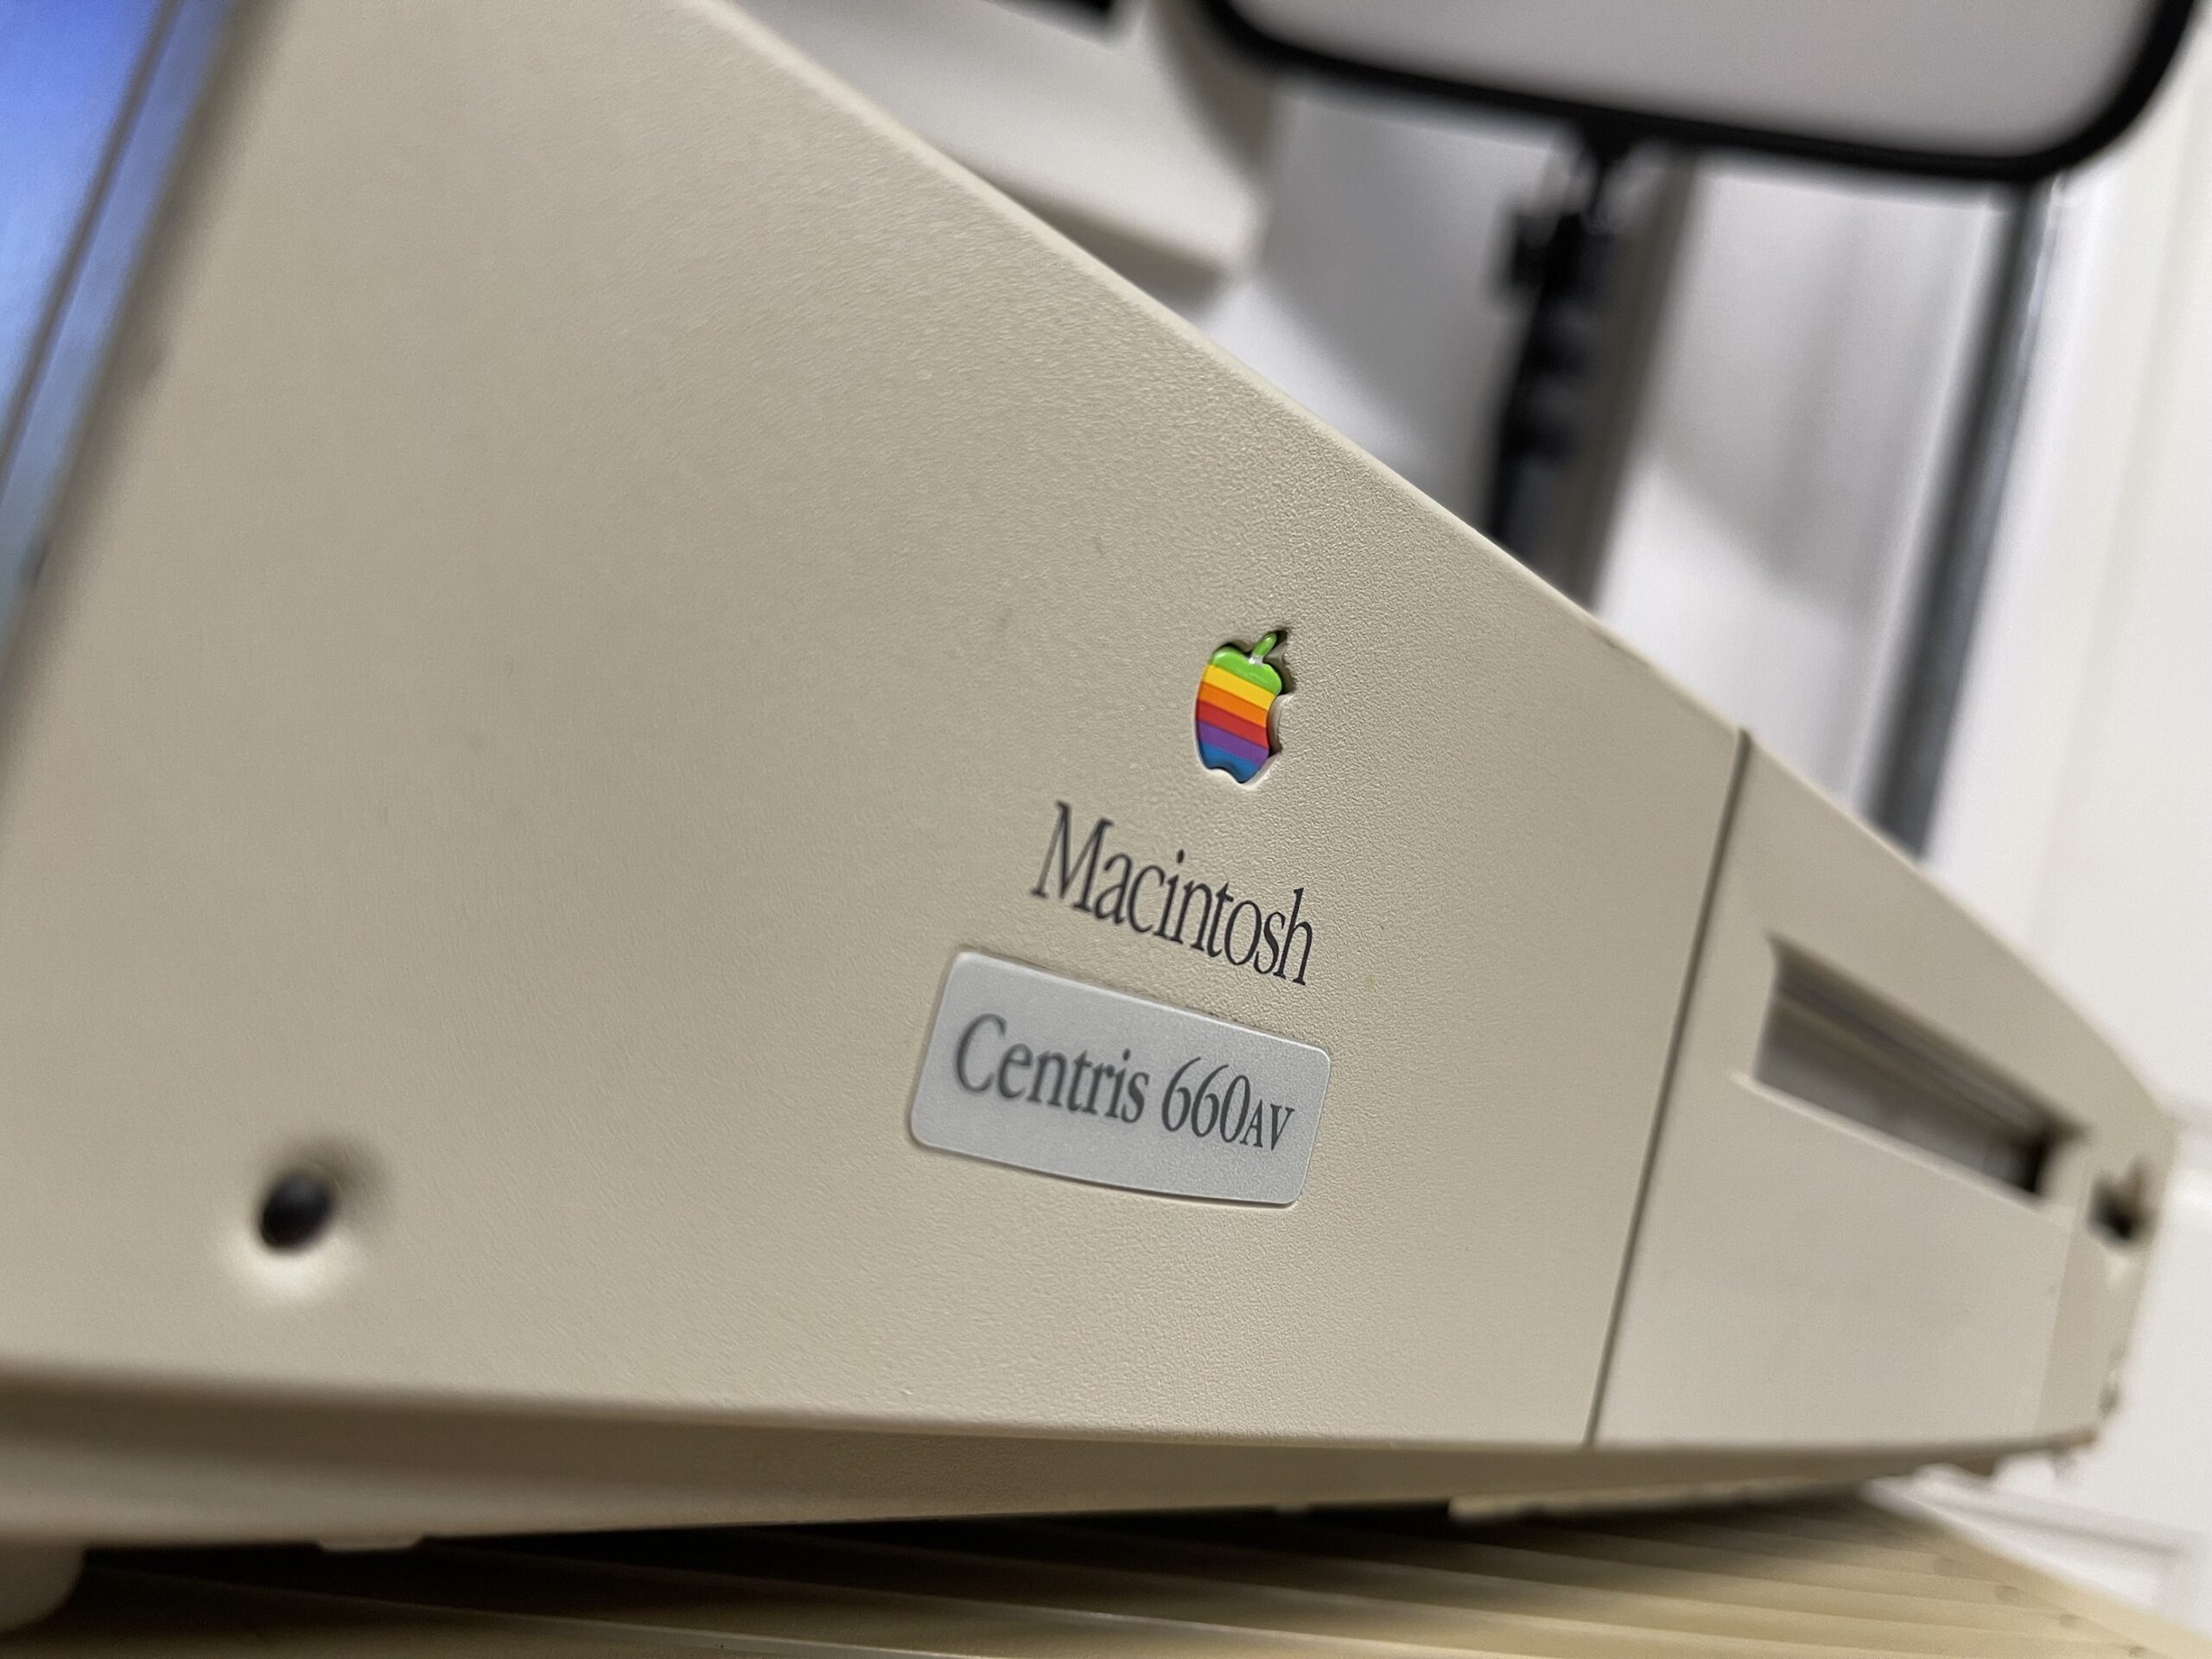 Macintosh Centris 660AV